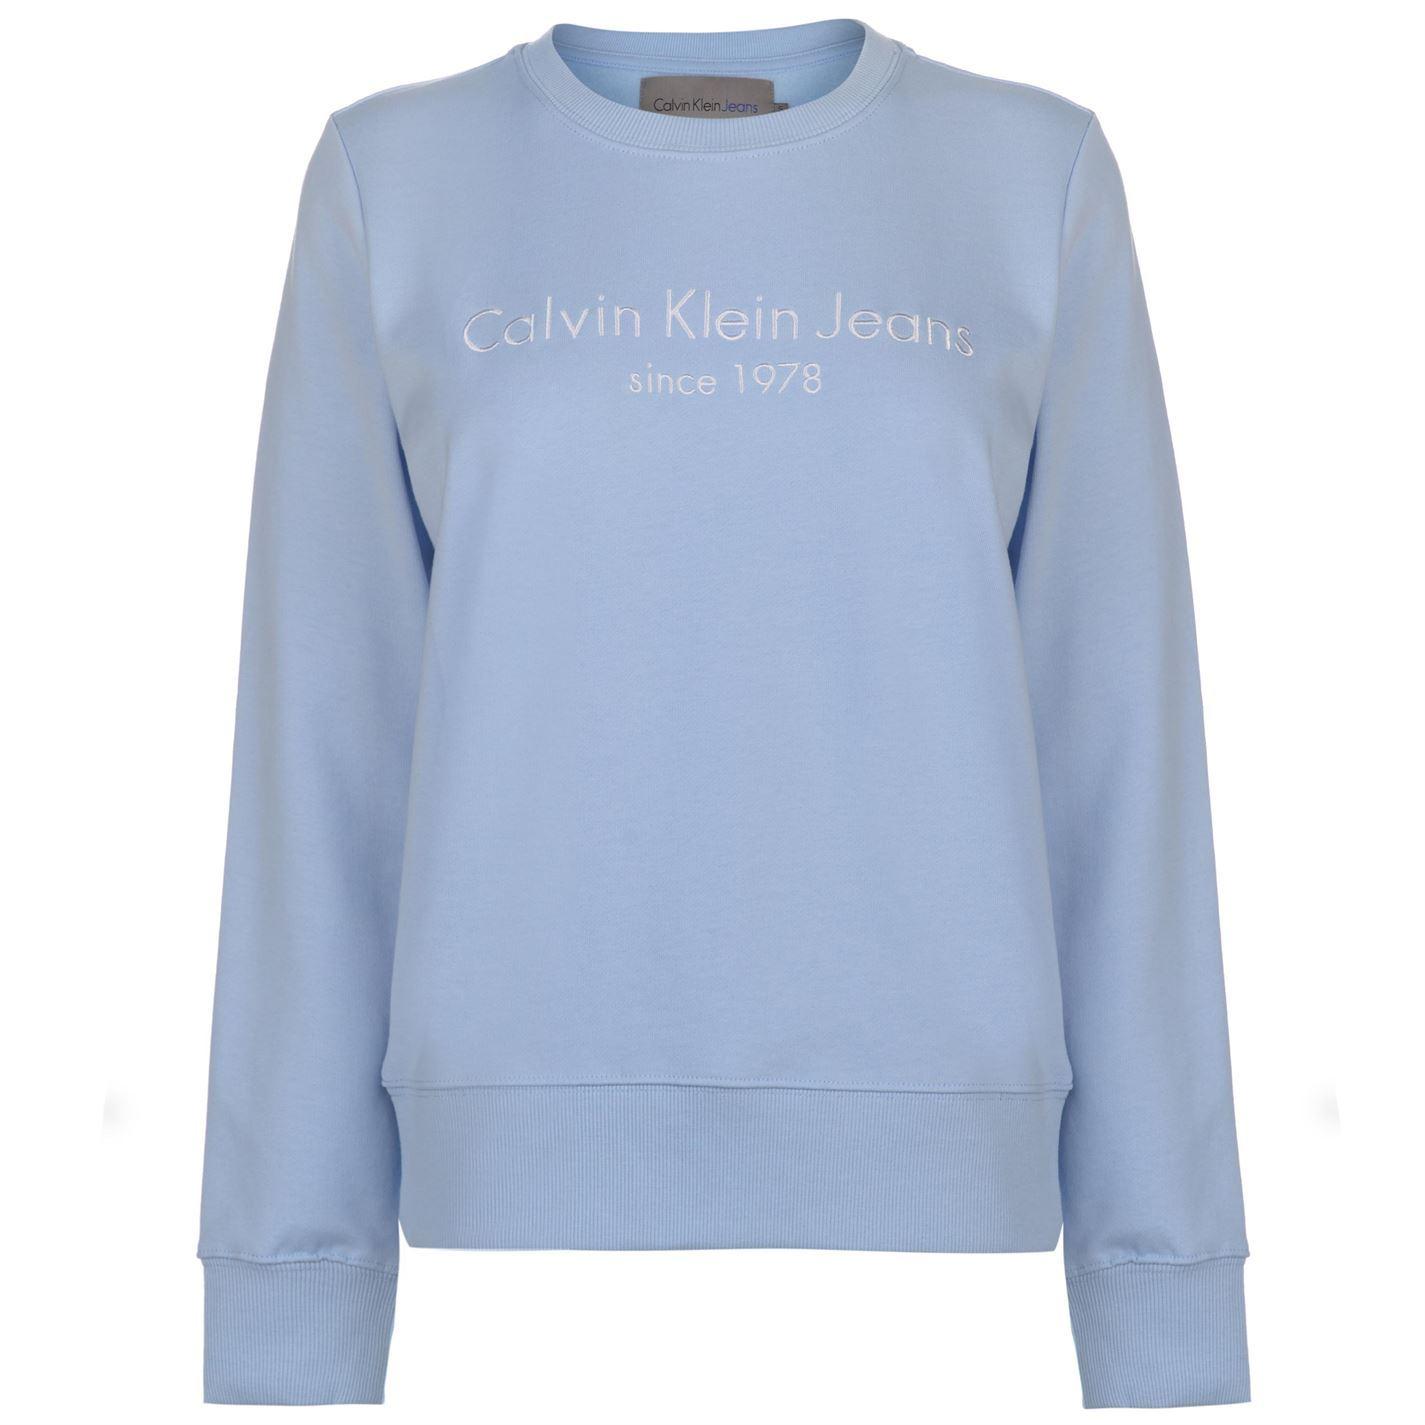 Calvin Klein Jeans BLEND INSTITUTIONAL - Pullover - blue 1973nLrh9